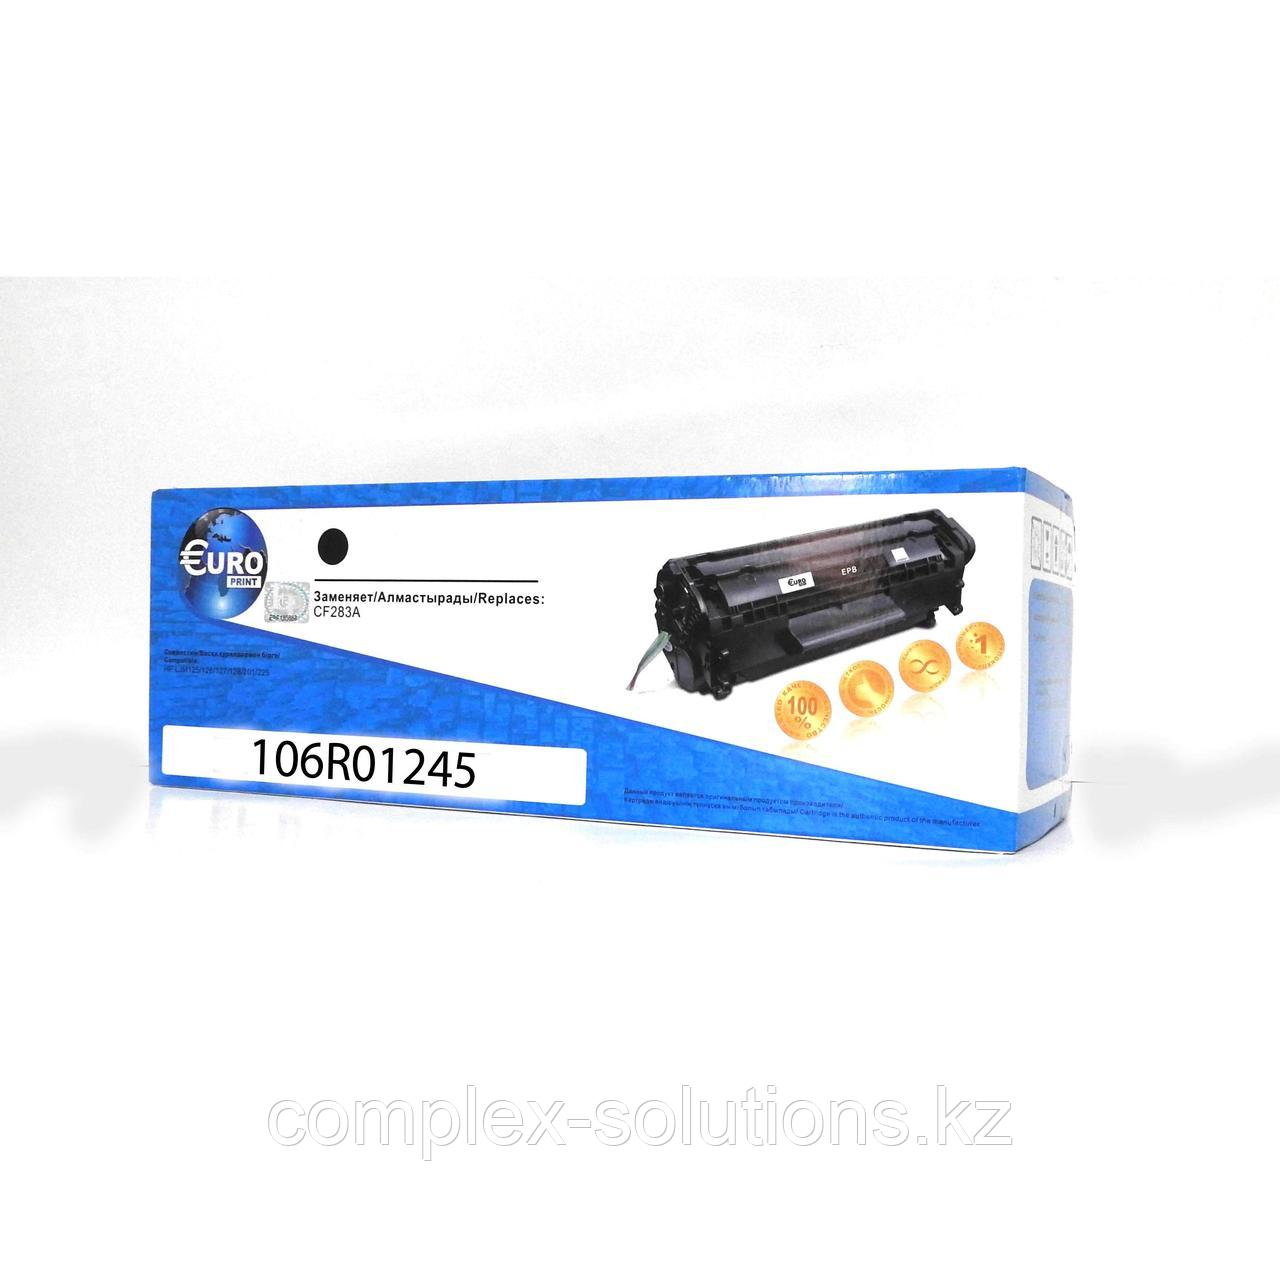 Картридж XEROX Phaser 3428 (106R01245) OEM | [качественный дубликат]